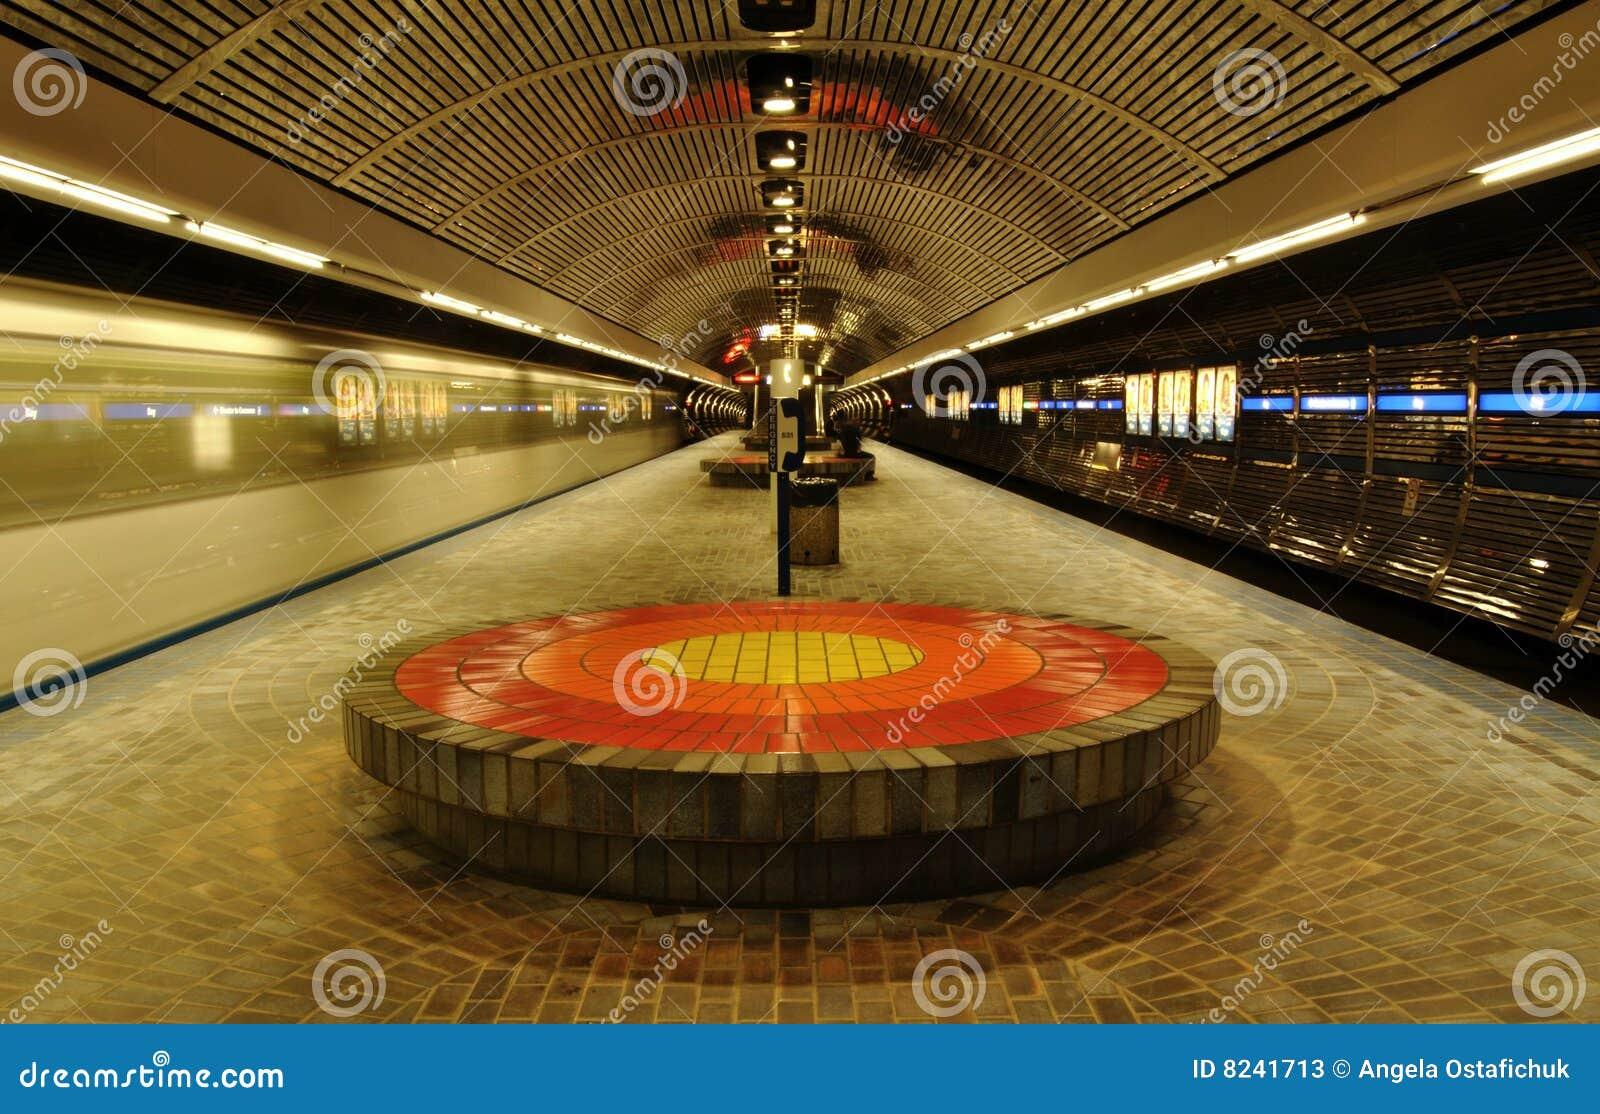 Edmonton train station